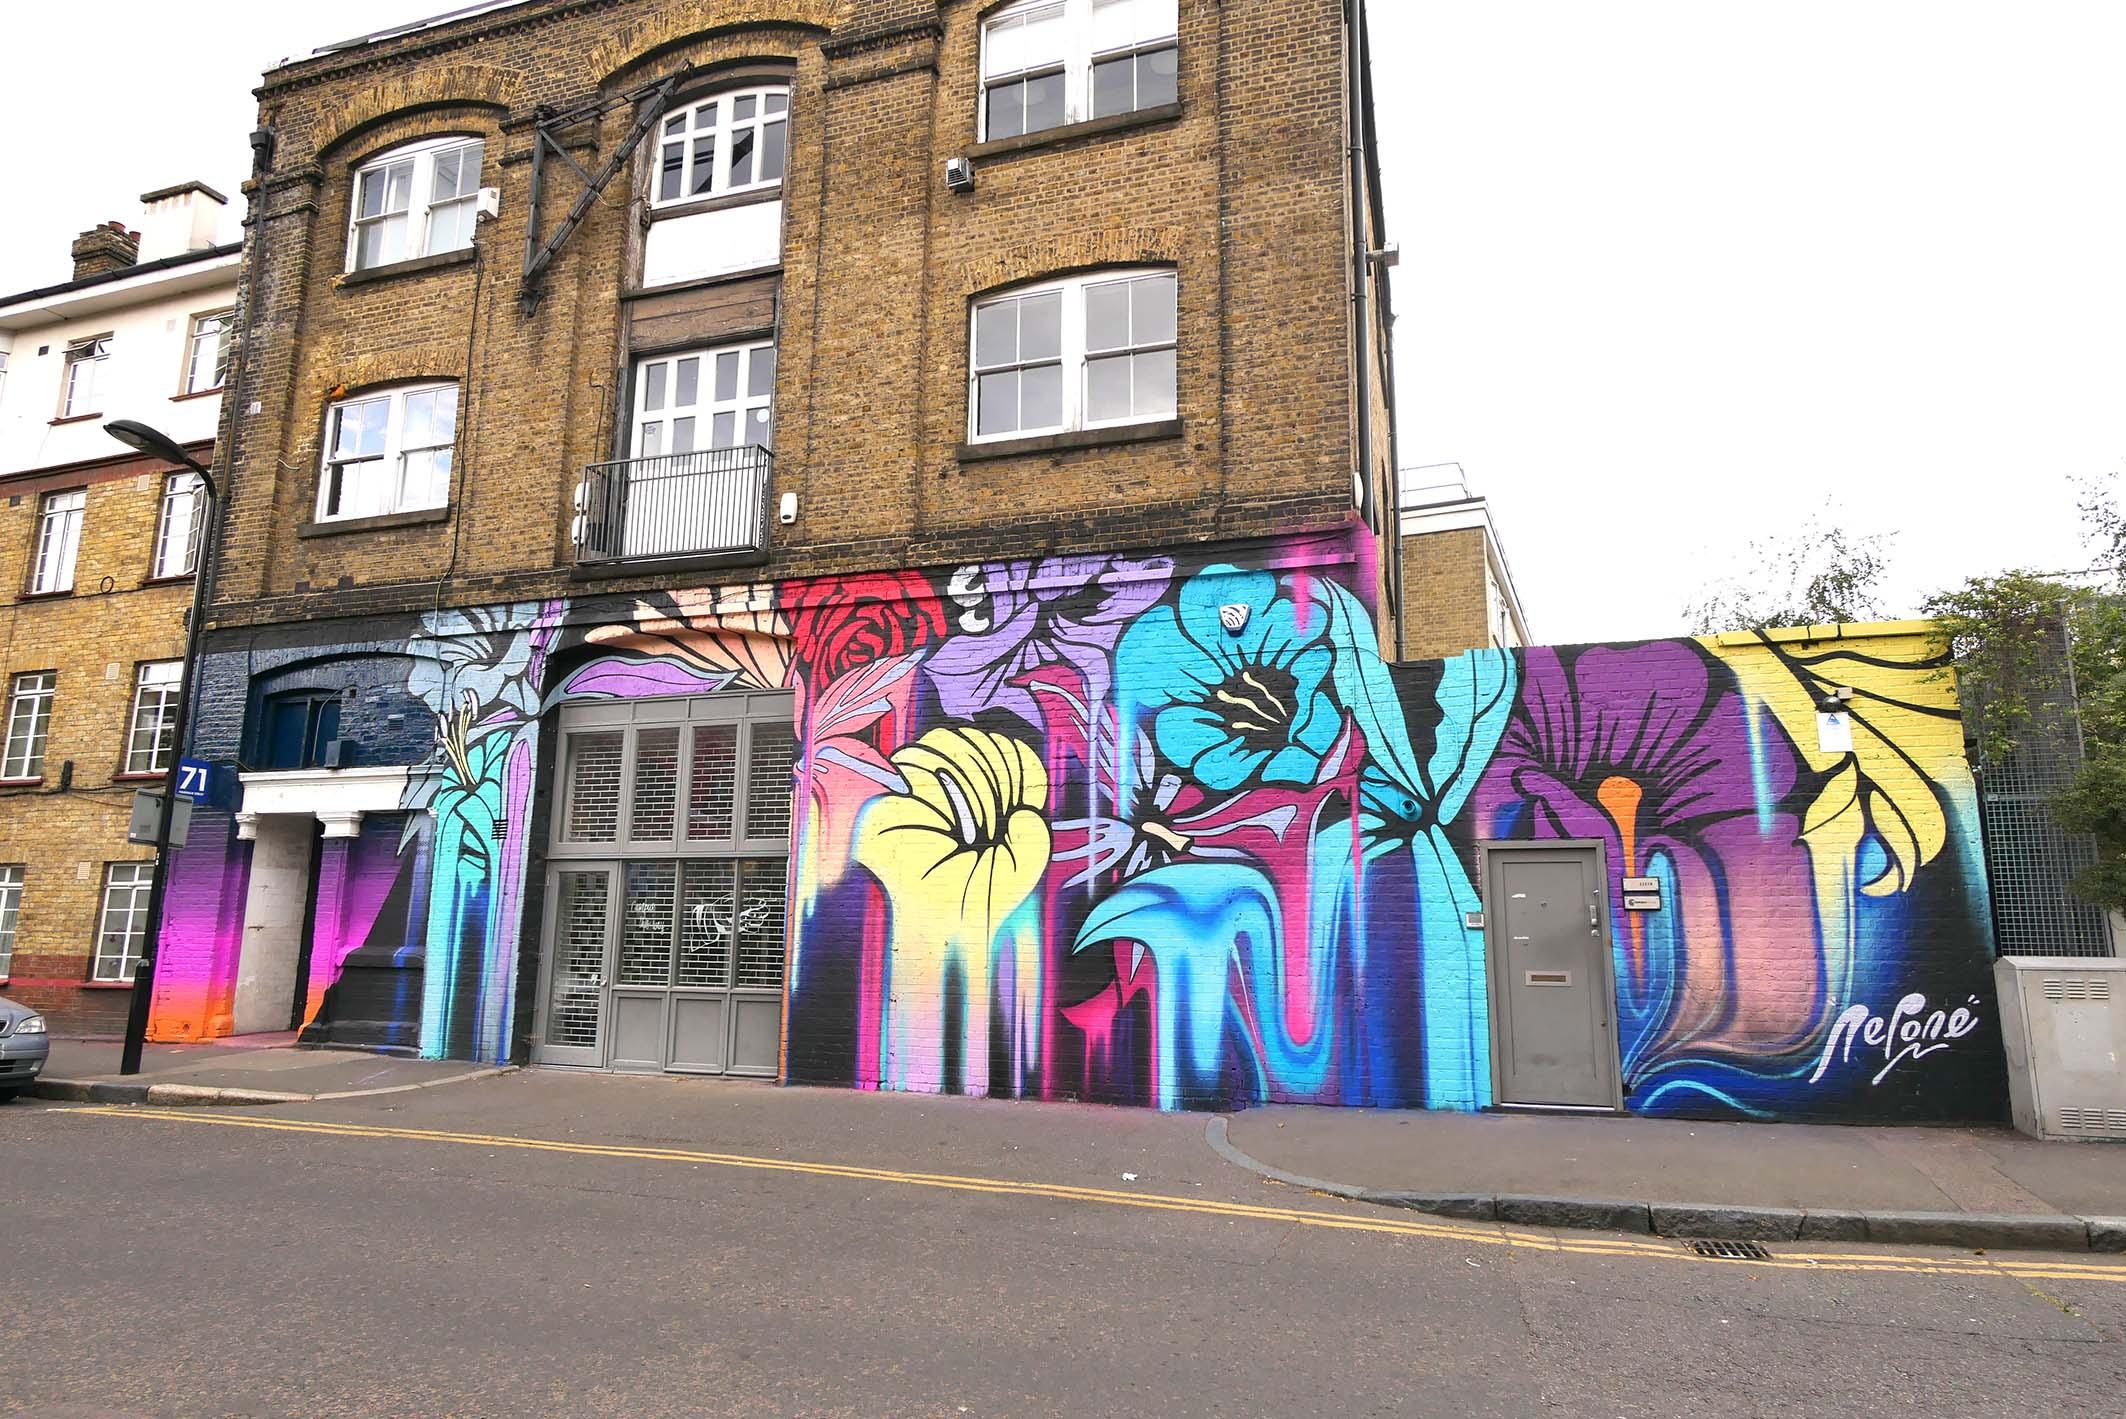 nerone-global-street-art-london-flowers-2